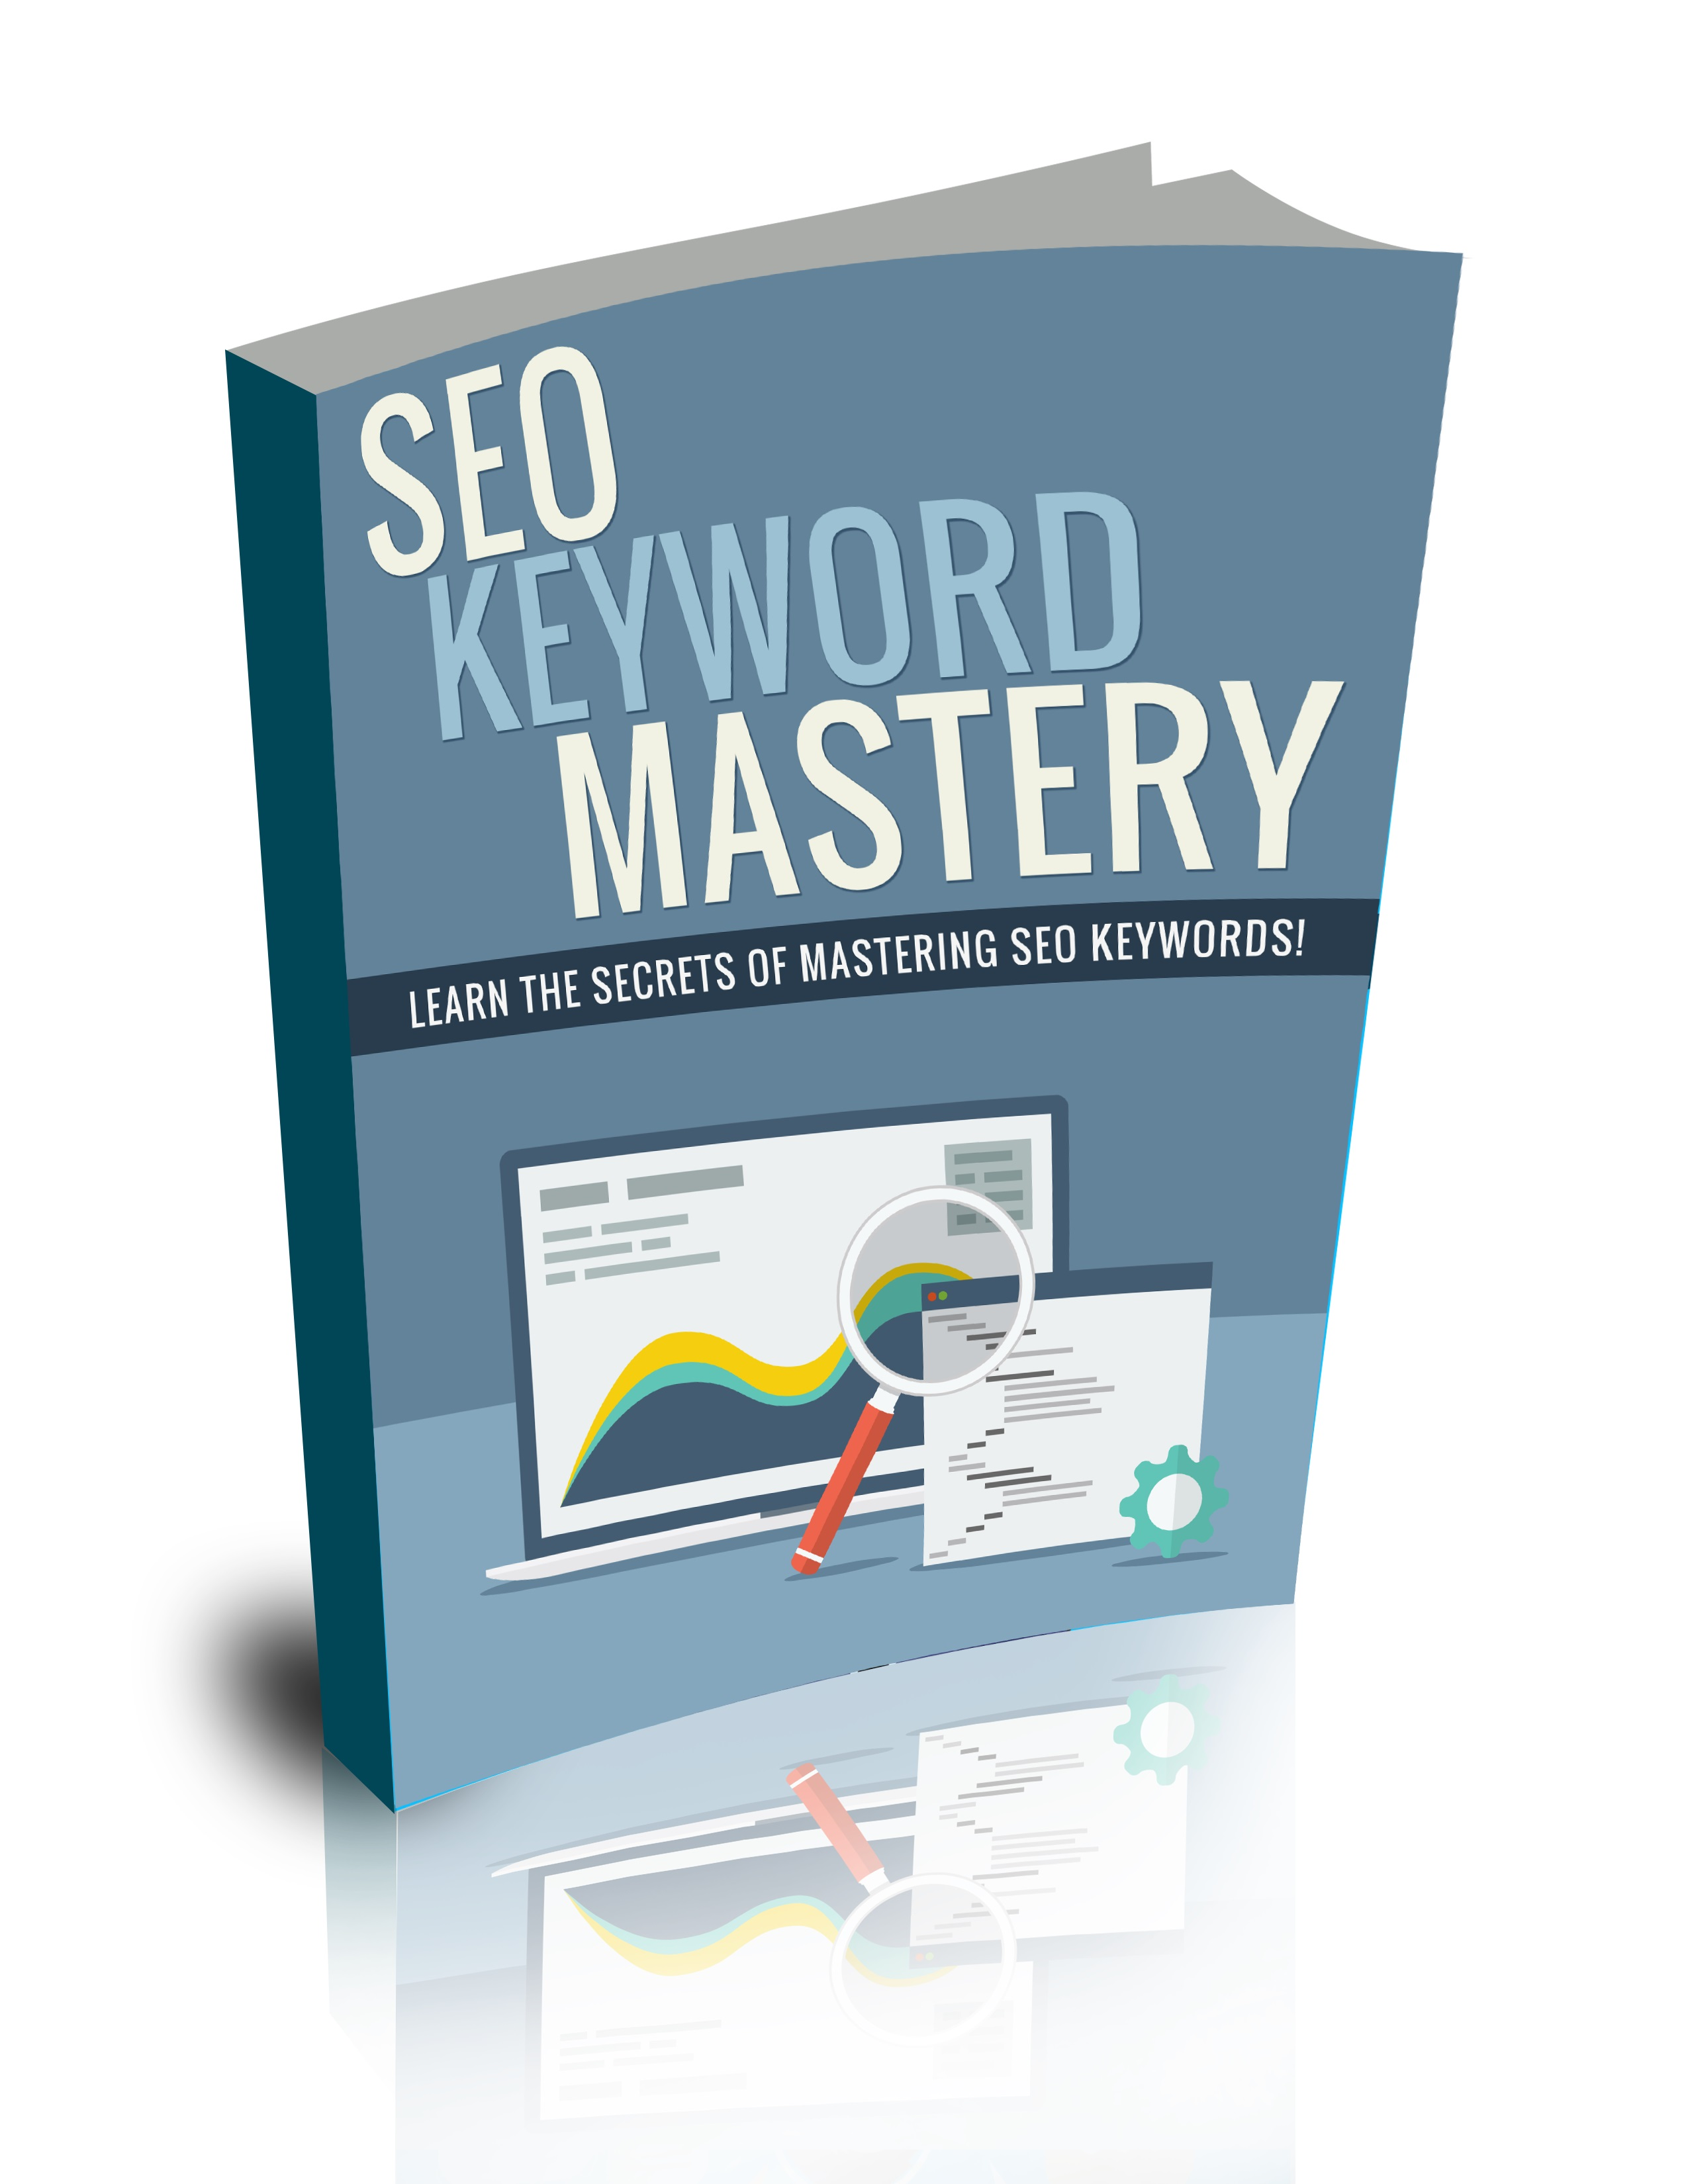 SEO Keyword Mastery Package